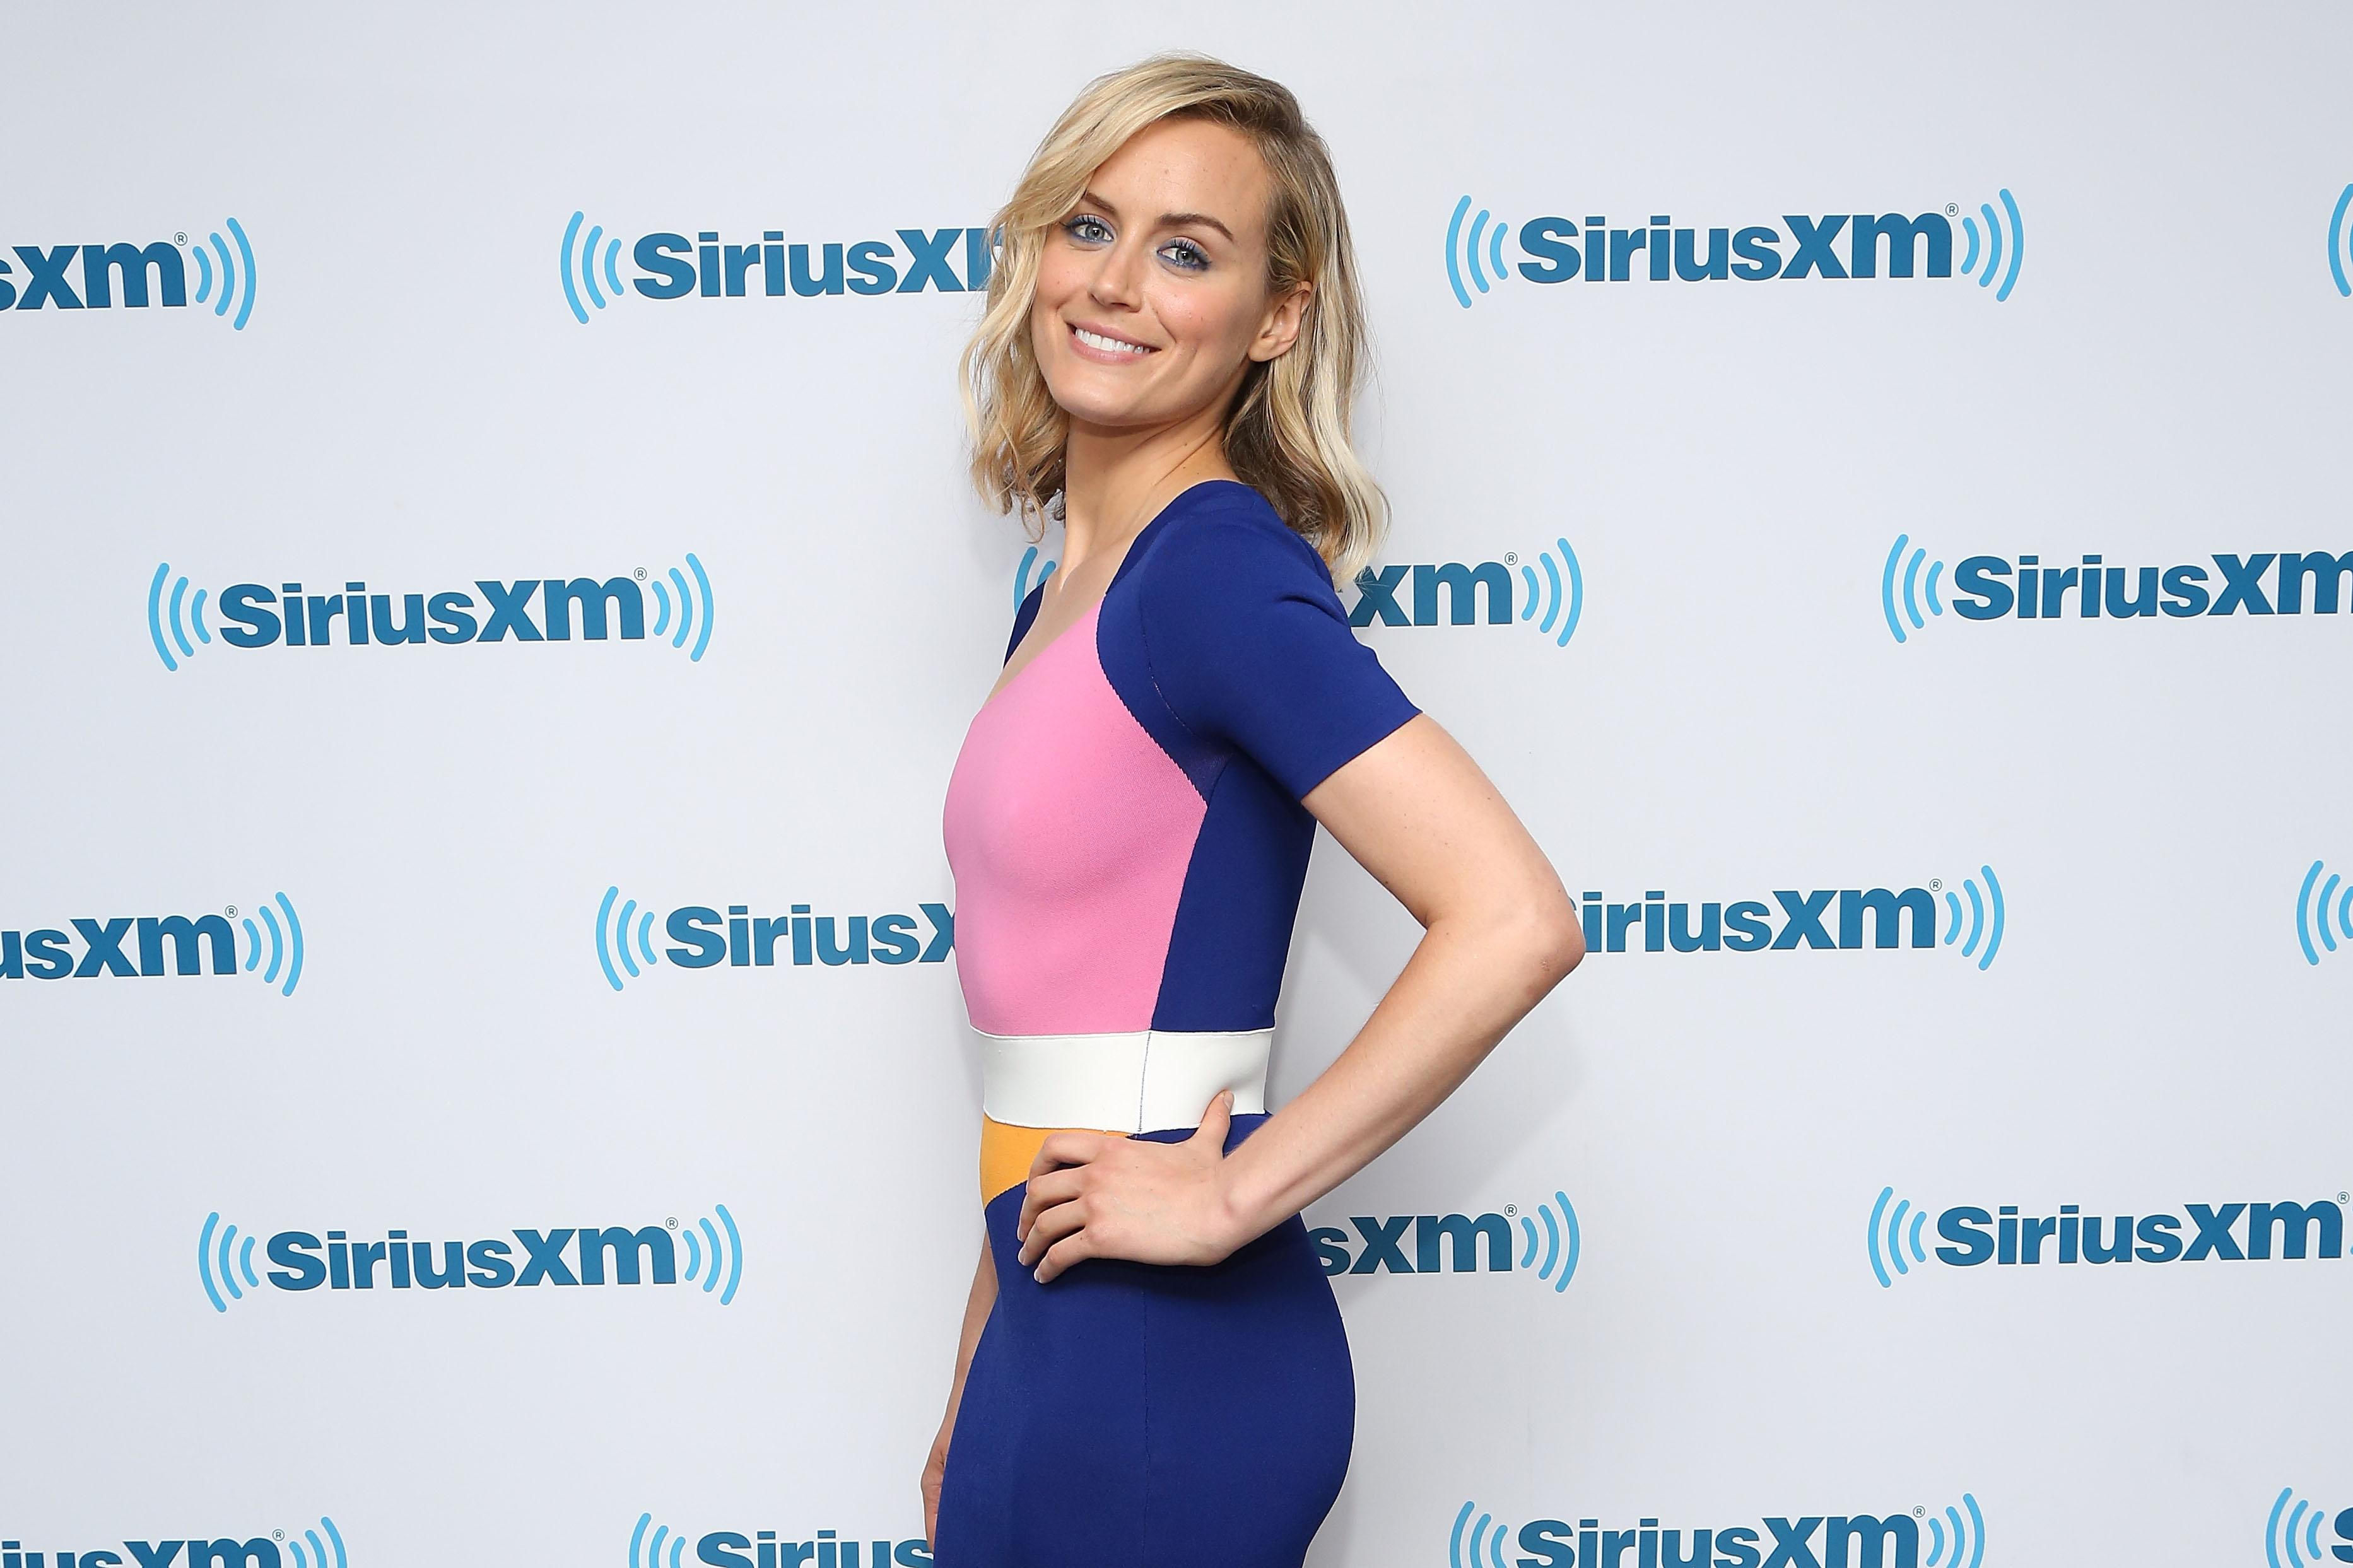 SiriusXM radio studios, NYC, Jul 31, 2014